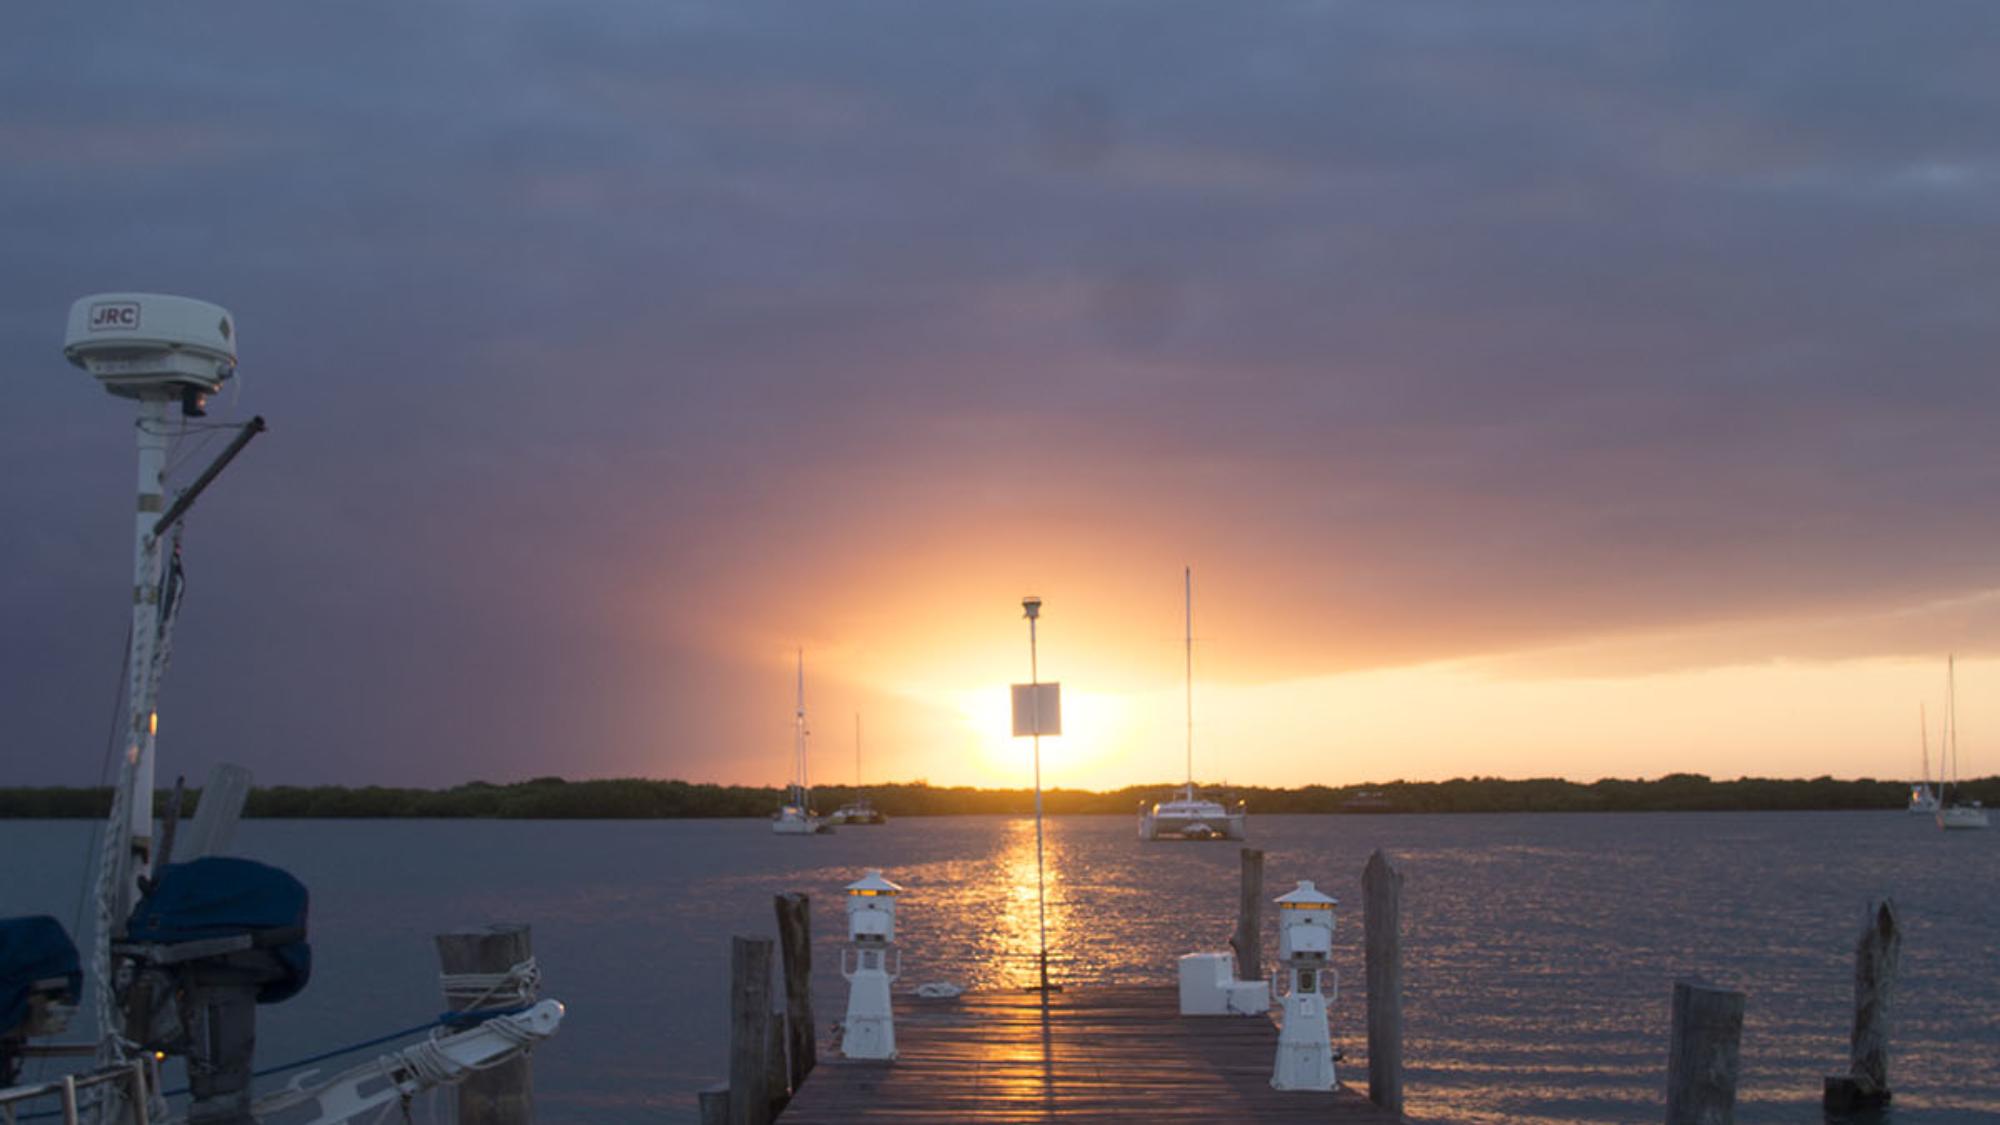 sunset at Marina Paraiso